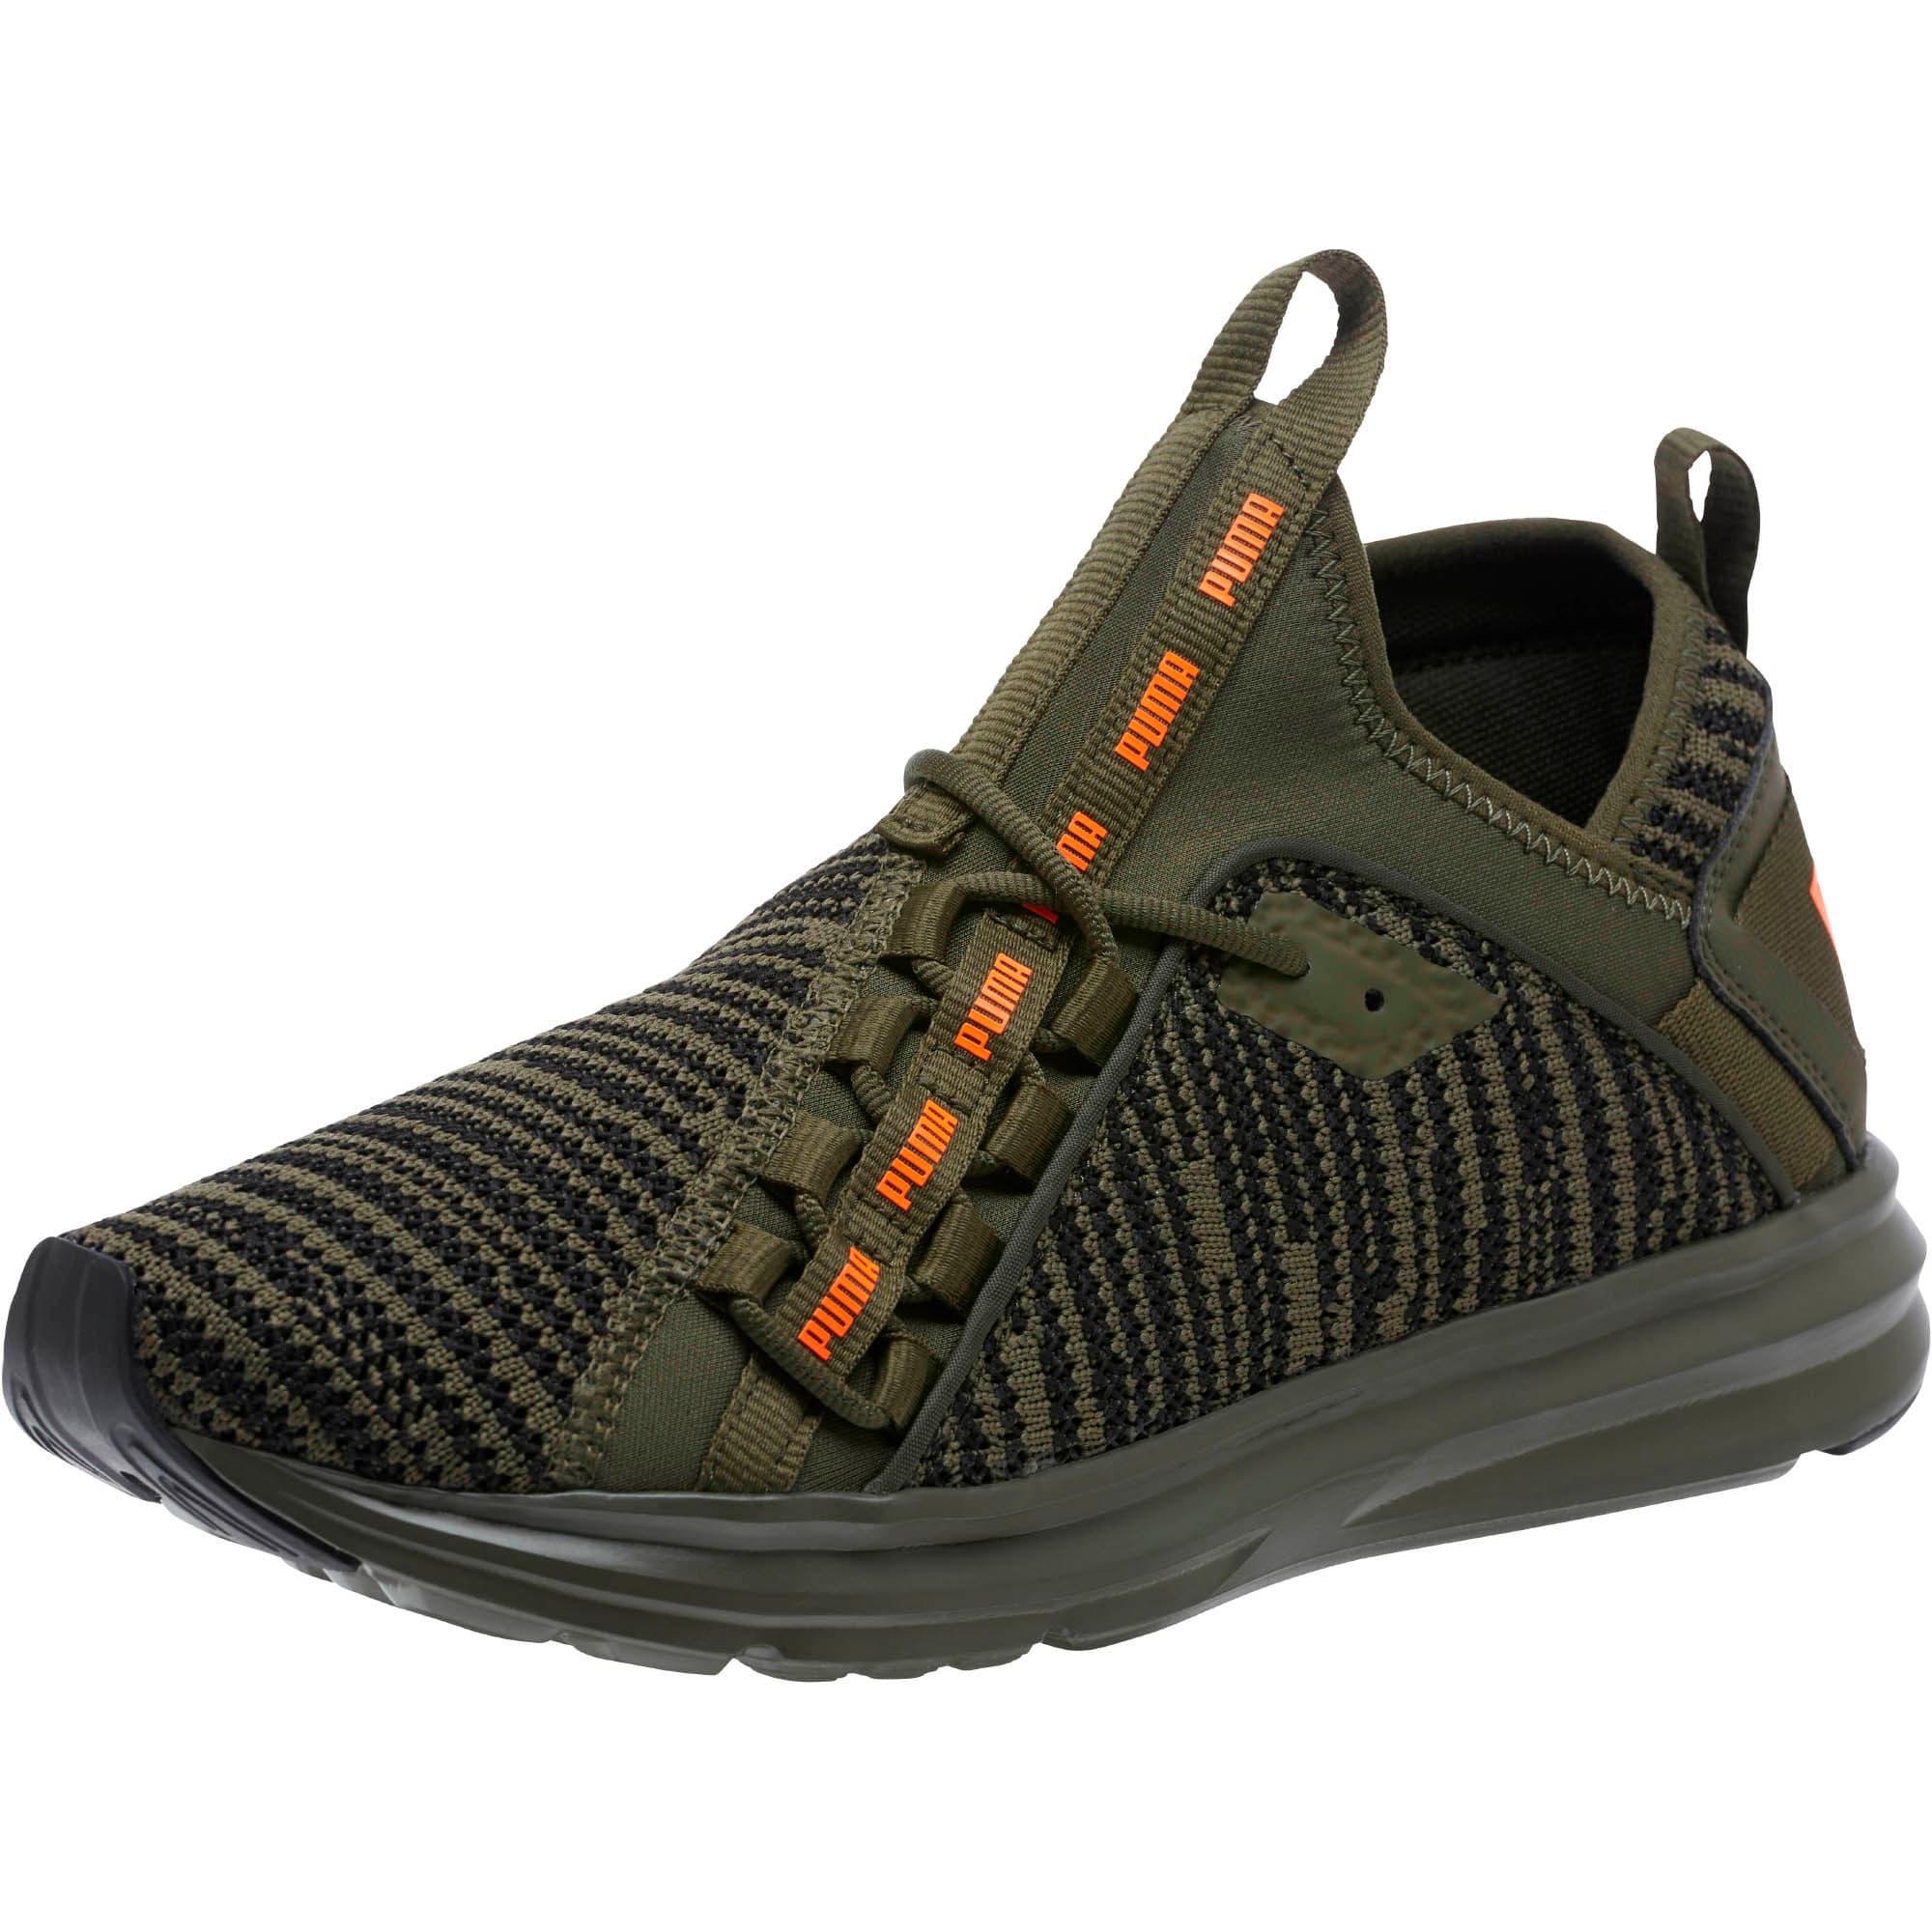 Thumbnail 1 of Enzo Peak Men's Sneakers, Forest Night-Black-Orange, medium